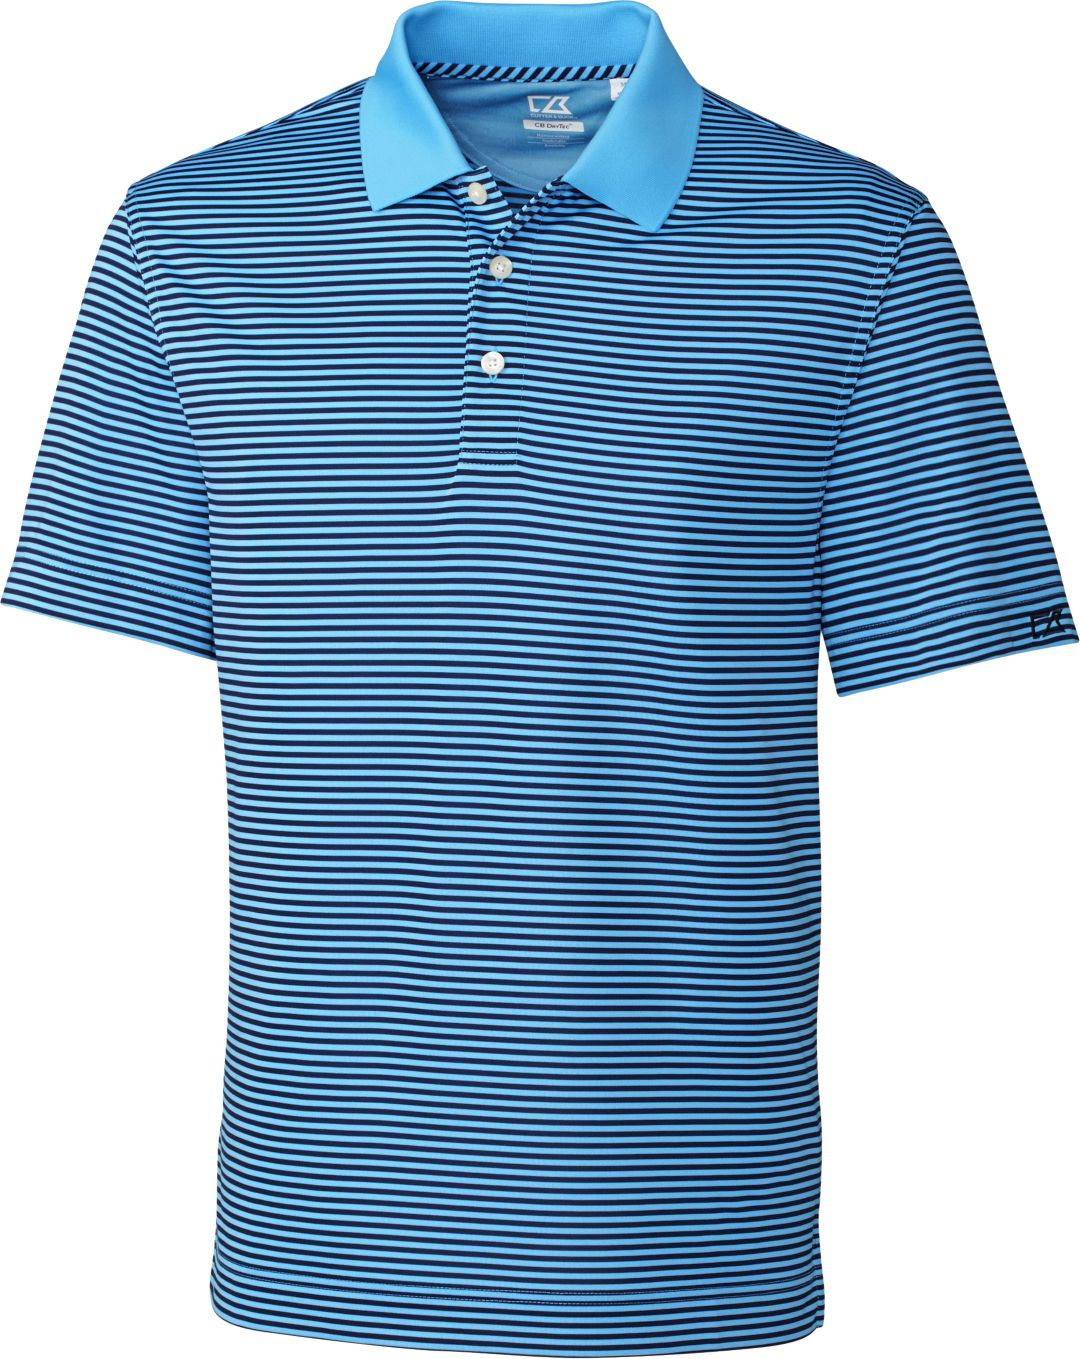 82b66b8a365 Cutter & Buck Men's CB DryTec Trevor Stripe Golf Polo